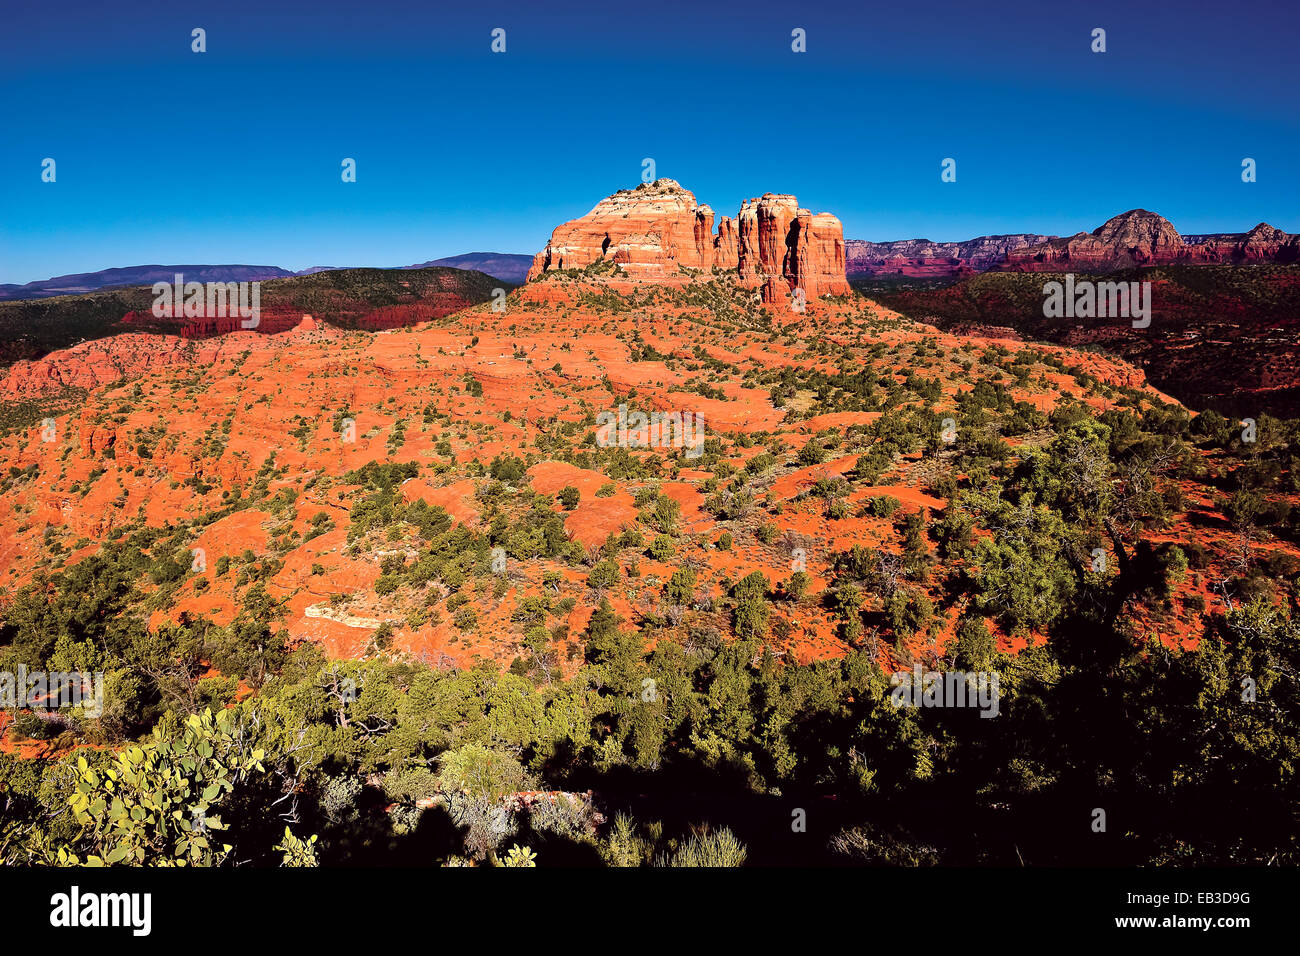 USA, Arizona, Yavapai County, Sedona, Cathedral Rock angesehen von Hiline Trail Vista East side Stockbild